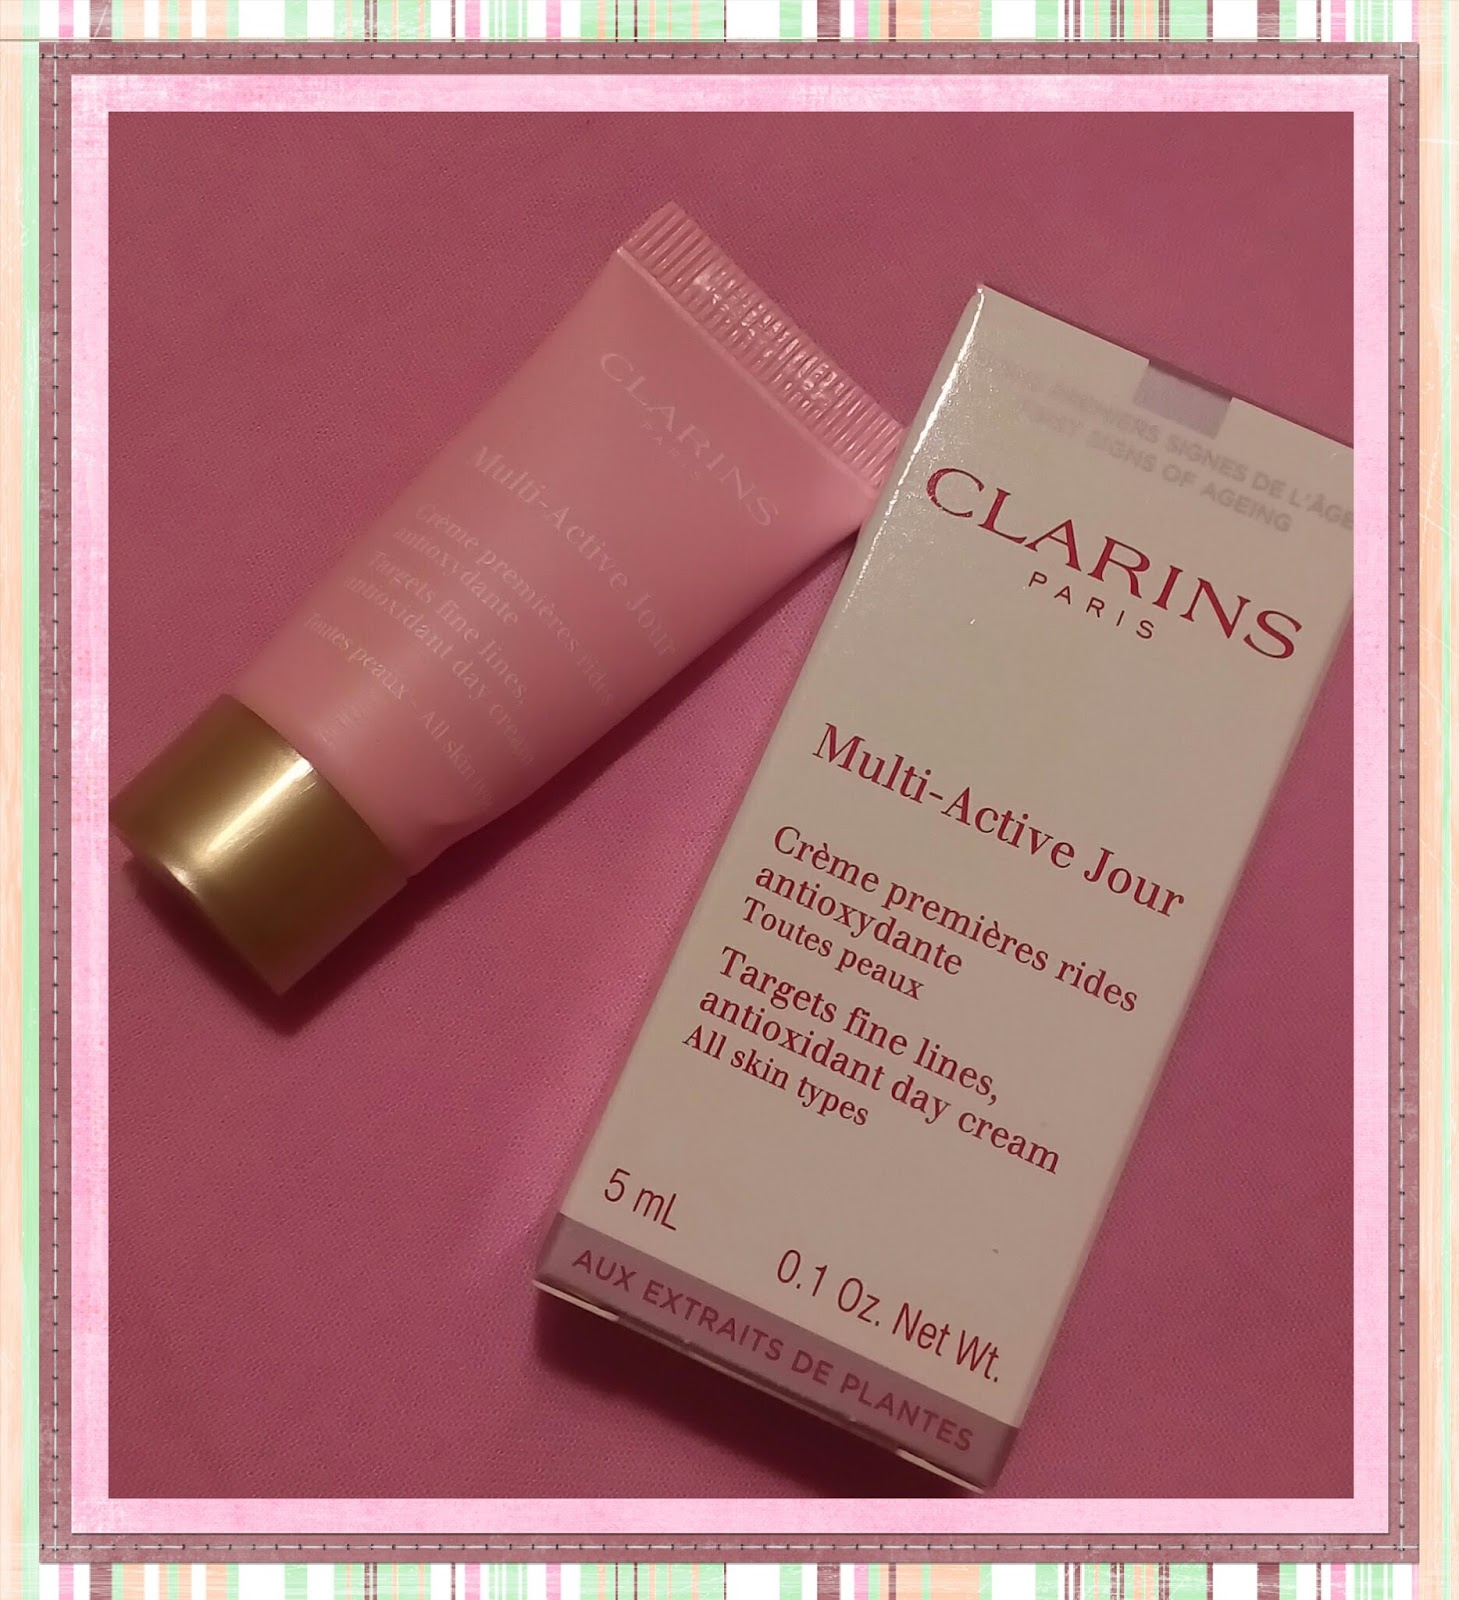 ClarinsMen Line-Control Balm by Clarins #18